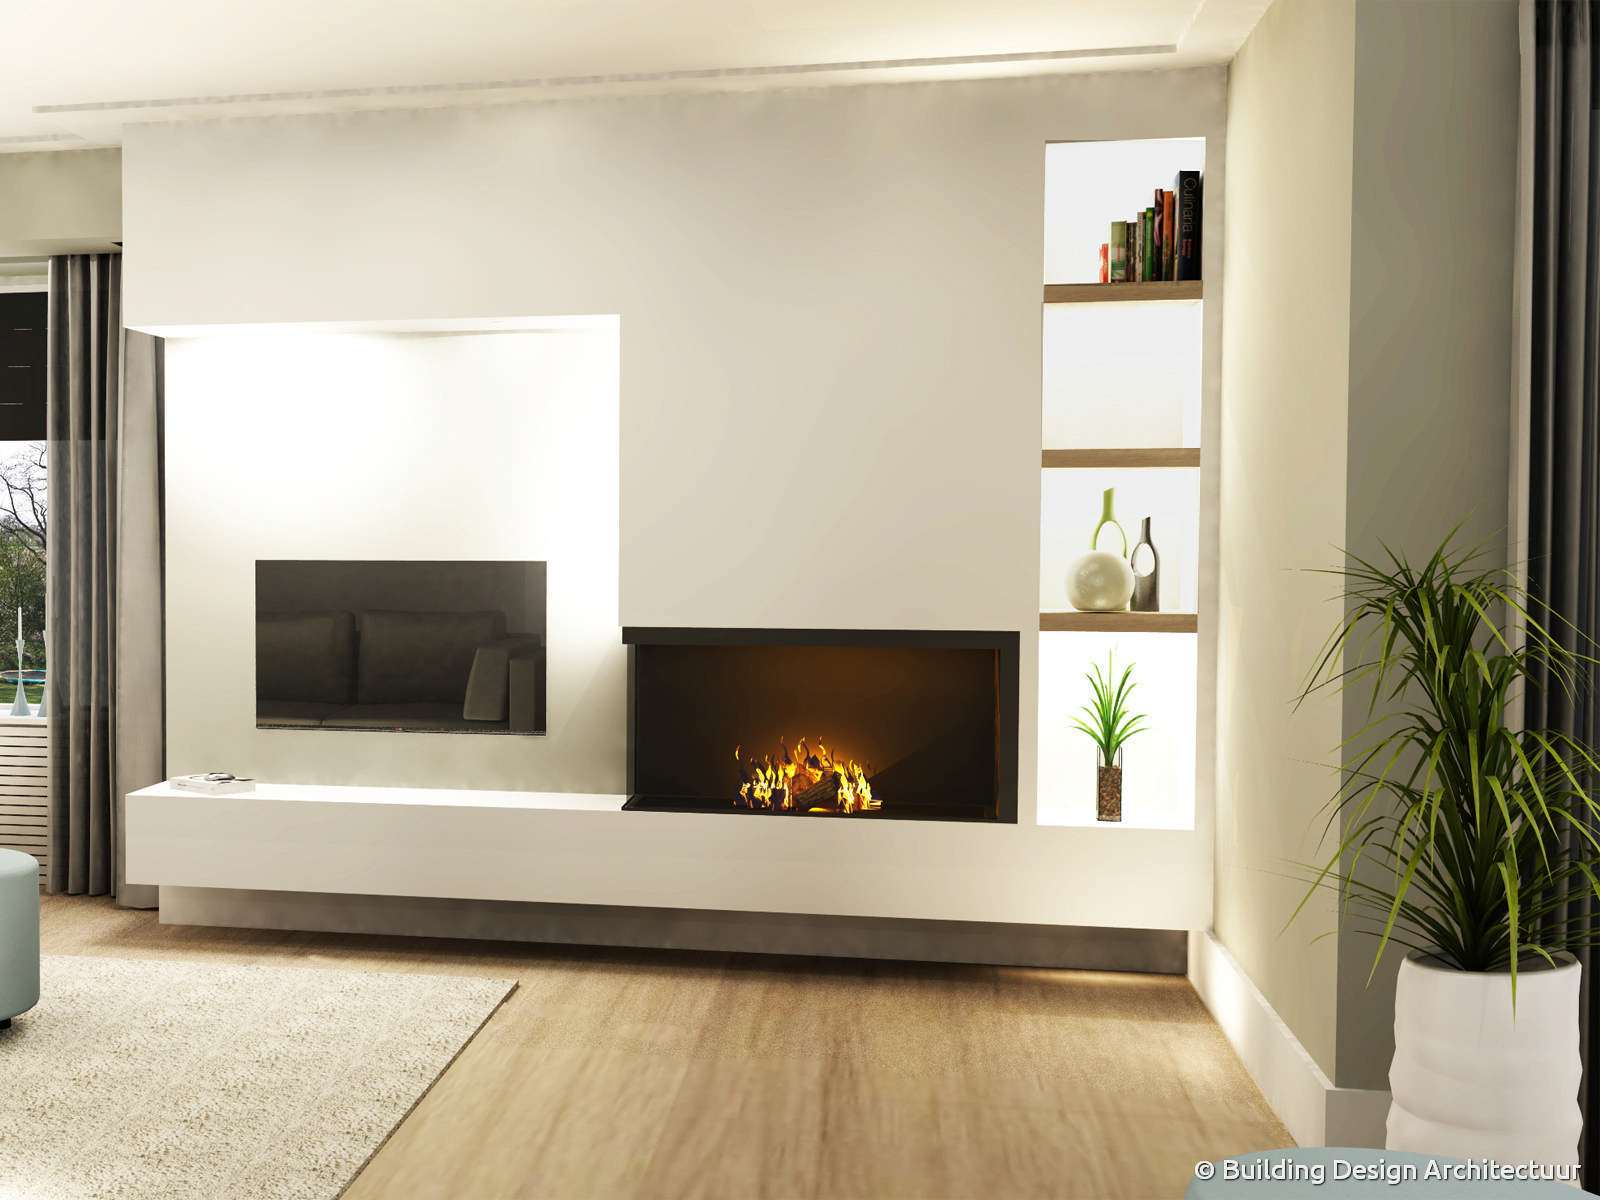 Design commode slaapkamer for Slaapkamer landelijk modern